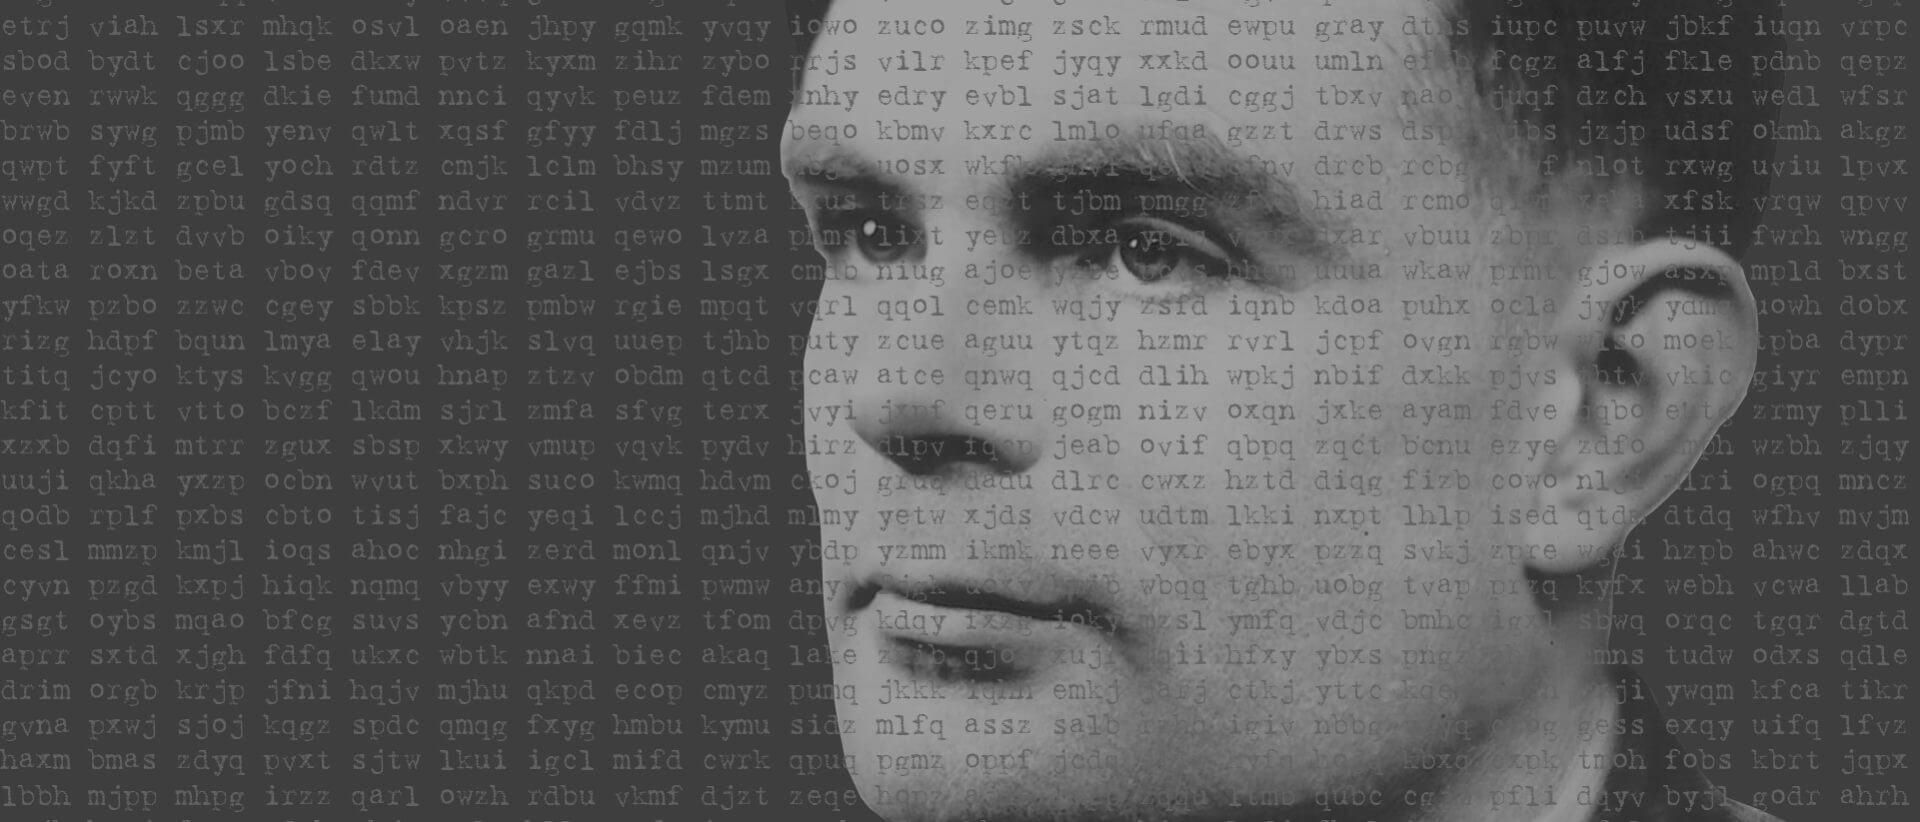 آلن تورینگ پدر علم کامپیوتر